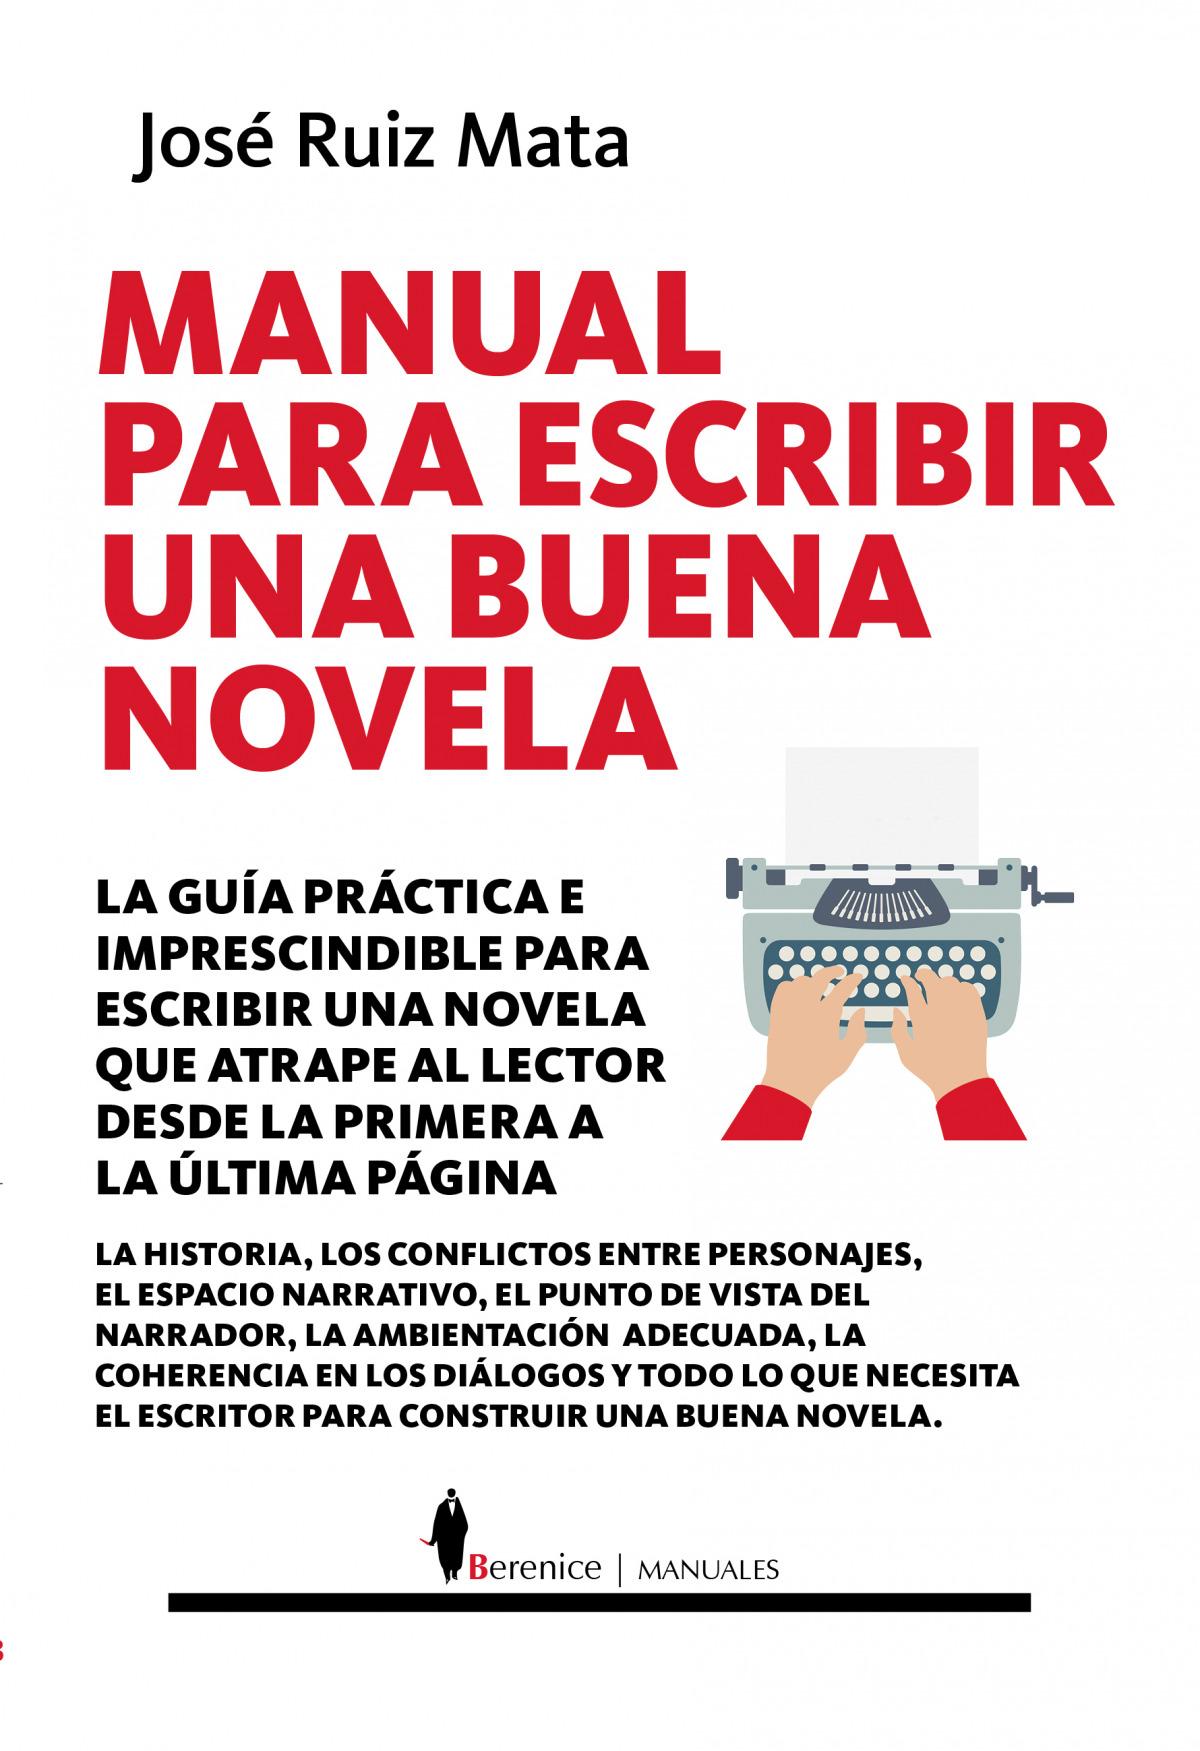 Manual para escribir una buena novela